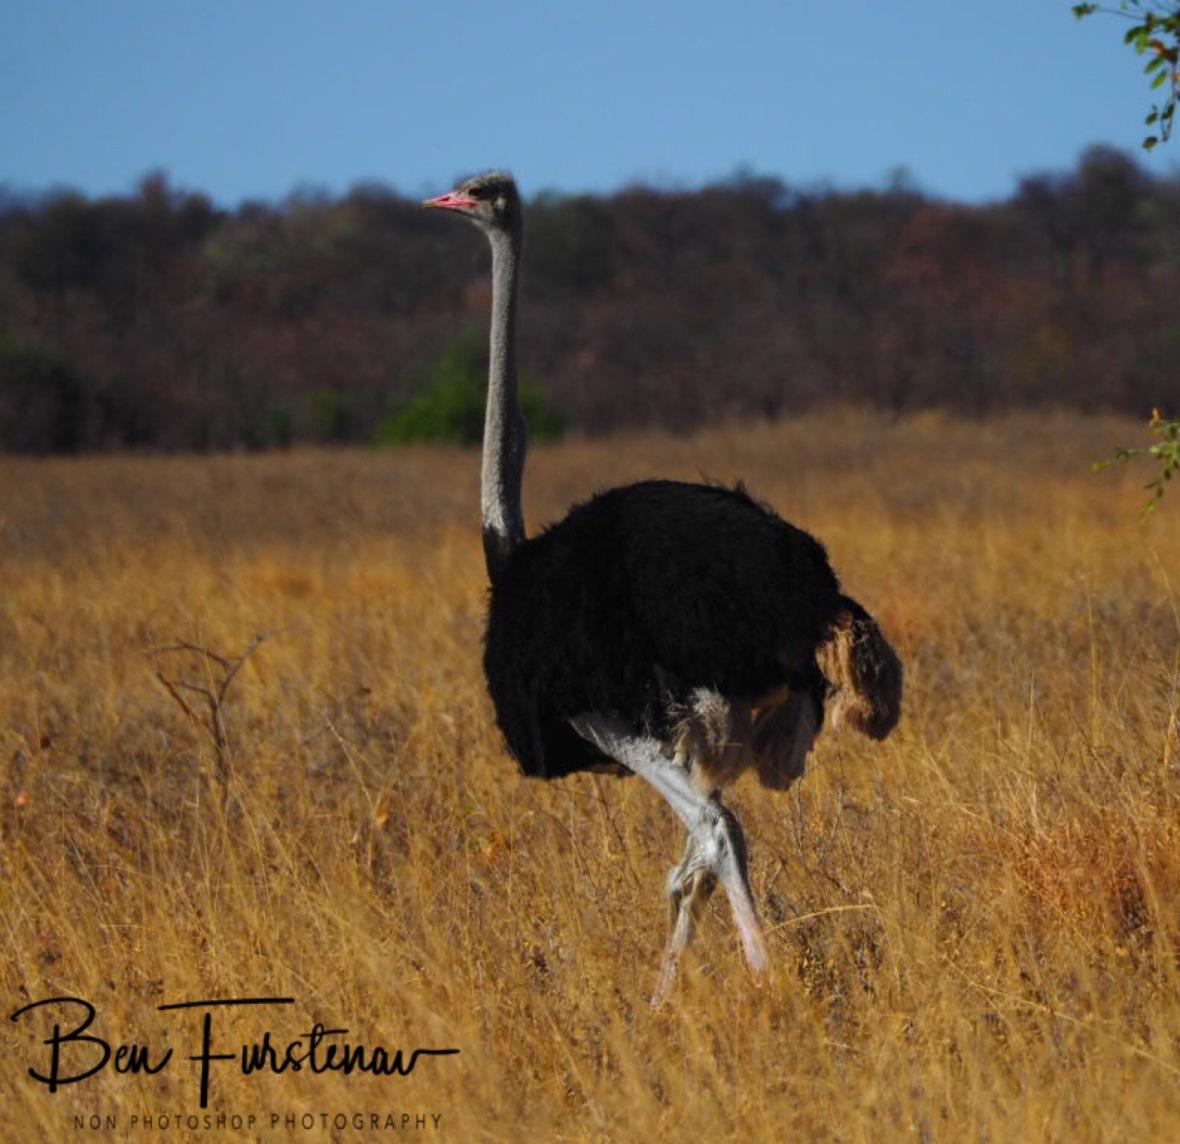 Ostrich roaming the savanna, Chobe National Park, Botswana